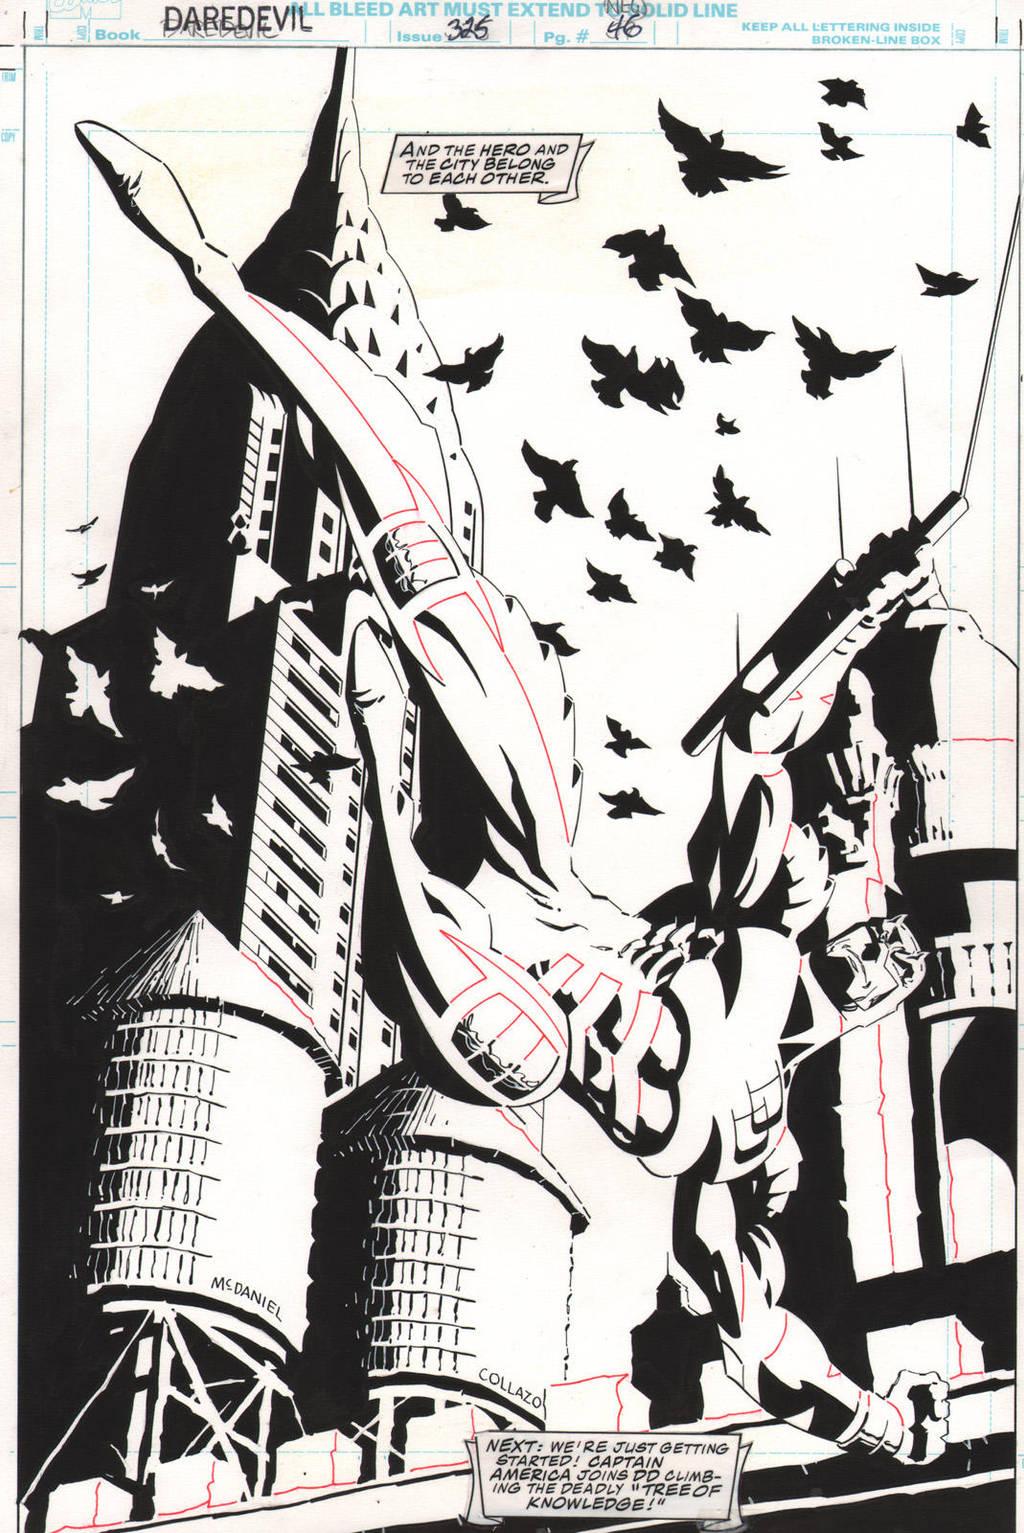 Daredevil #325 Page 46 by ScottMcDaniel